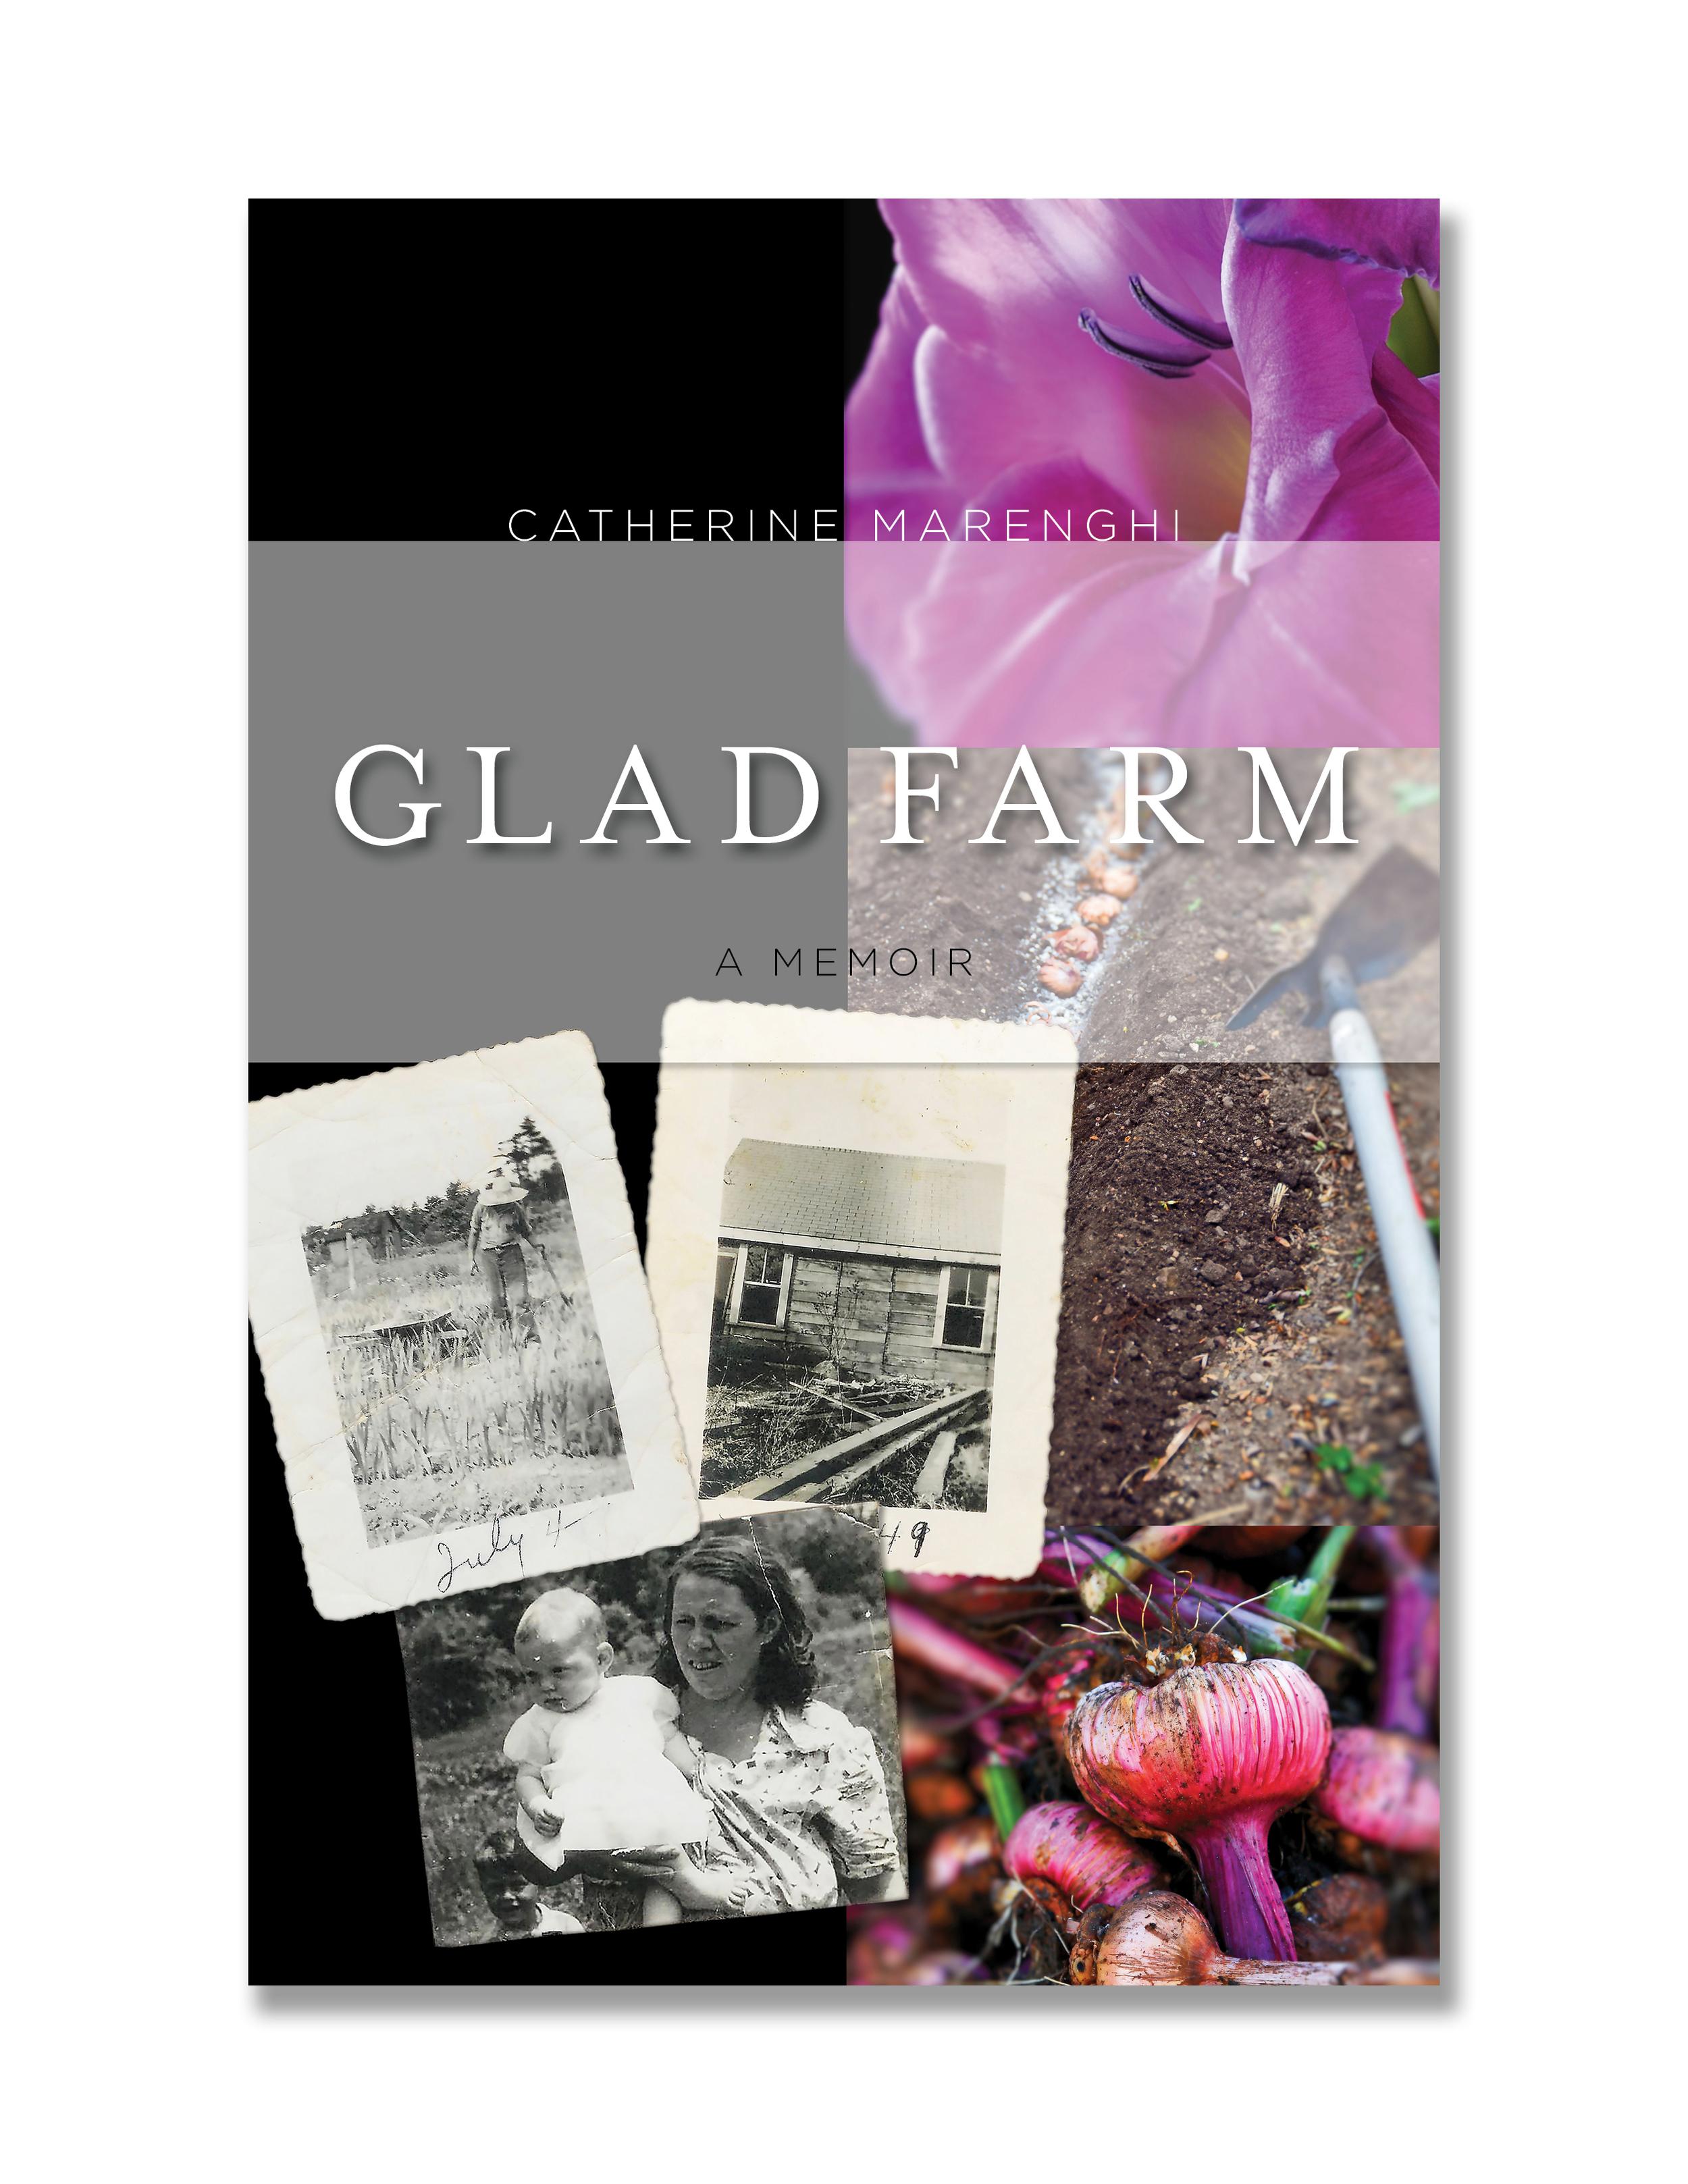 GLAD FARM: initial cover concept #2